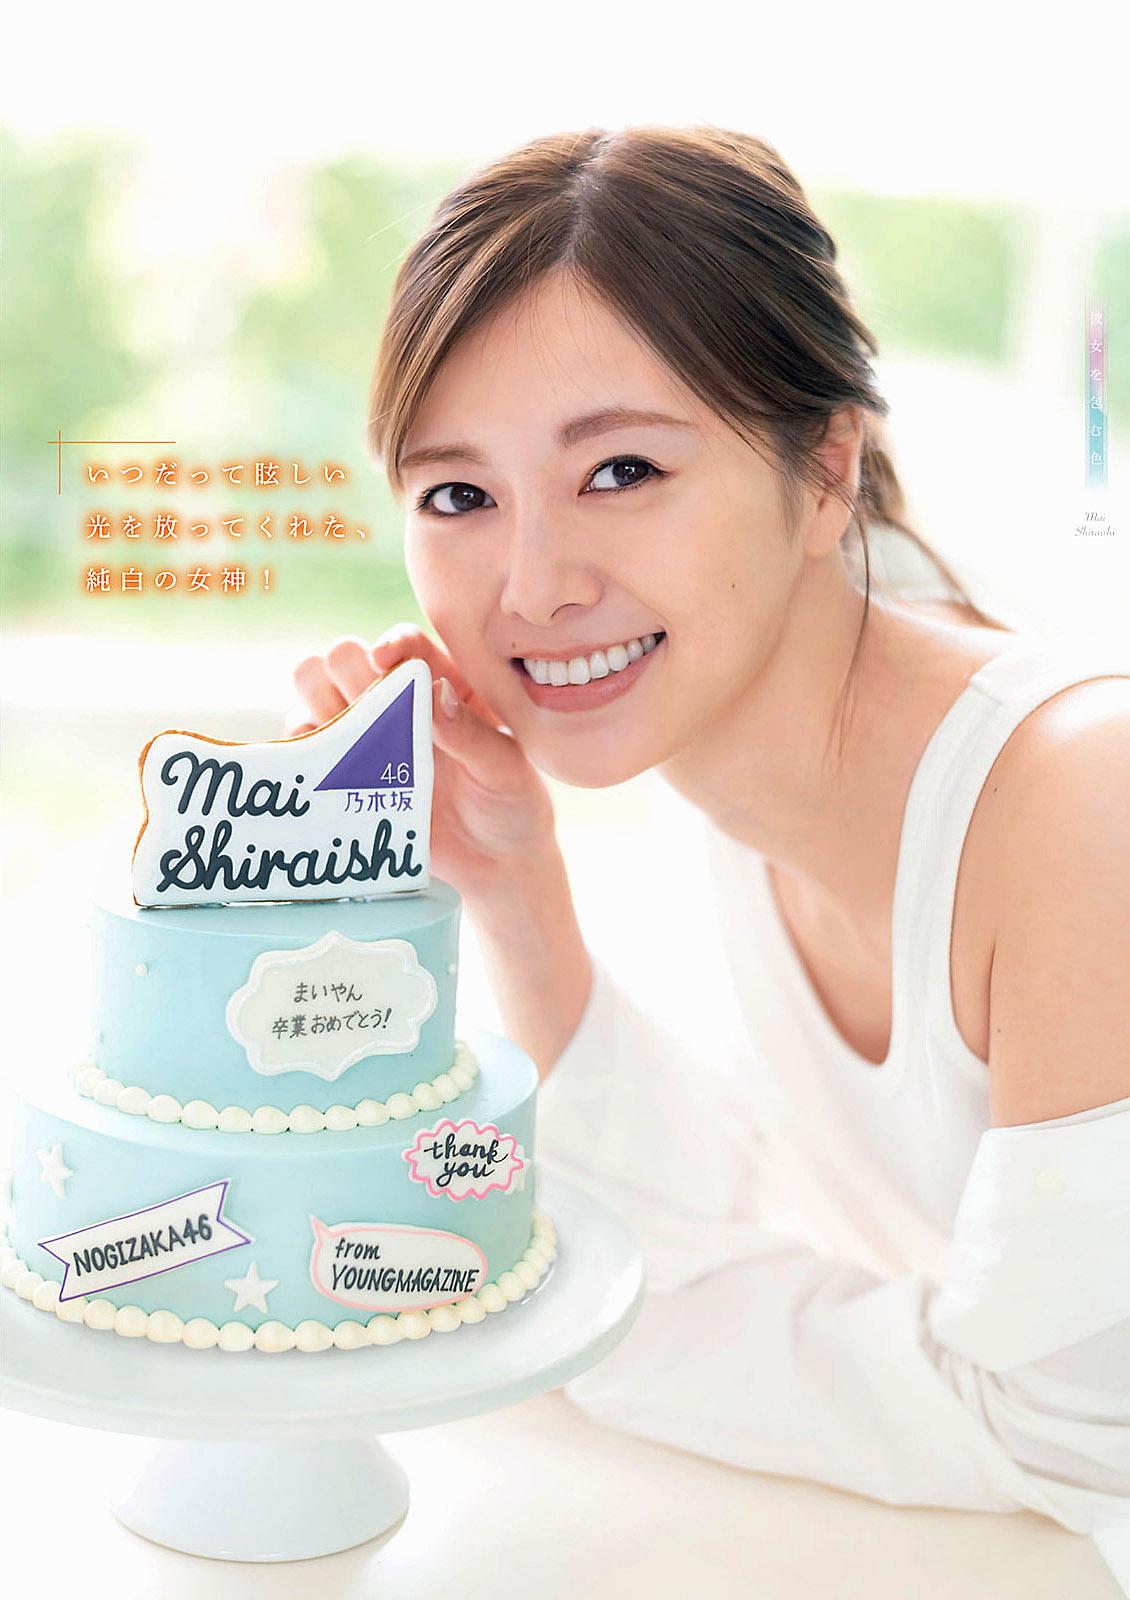 MShiraishi Young Magazine 200504 03.jpg